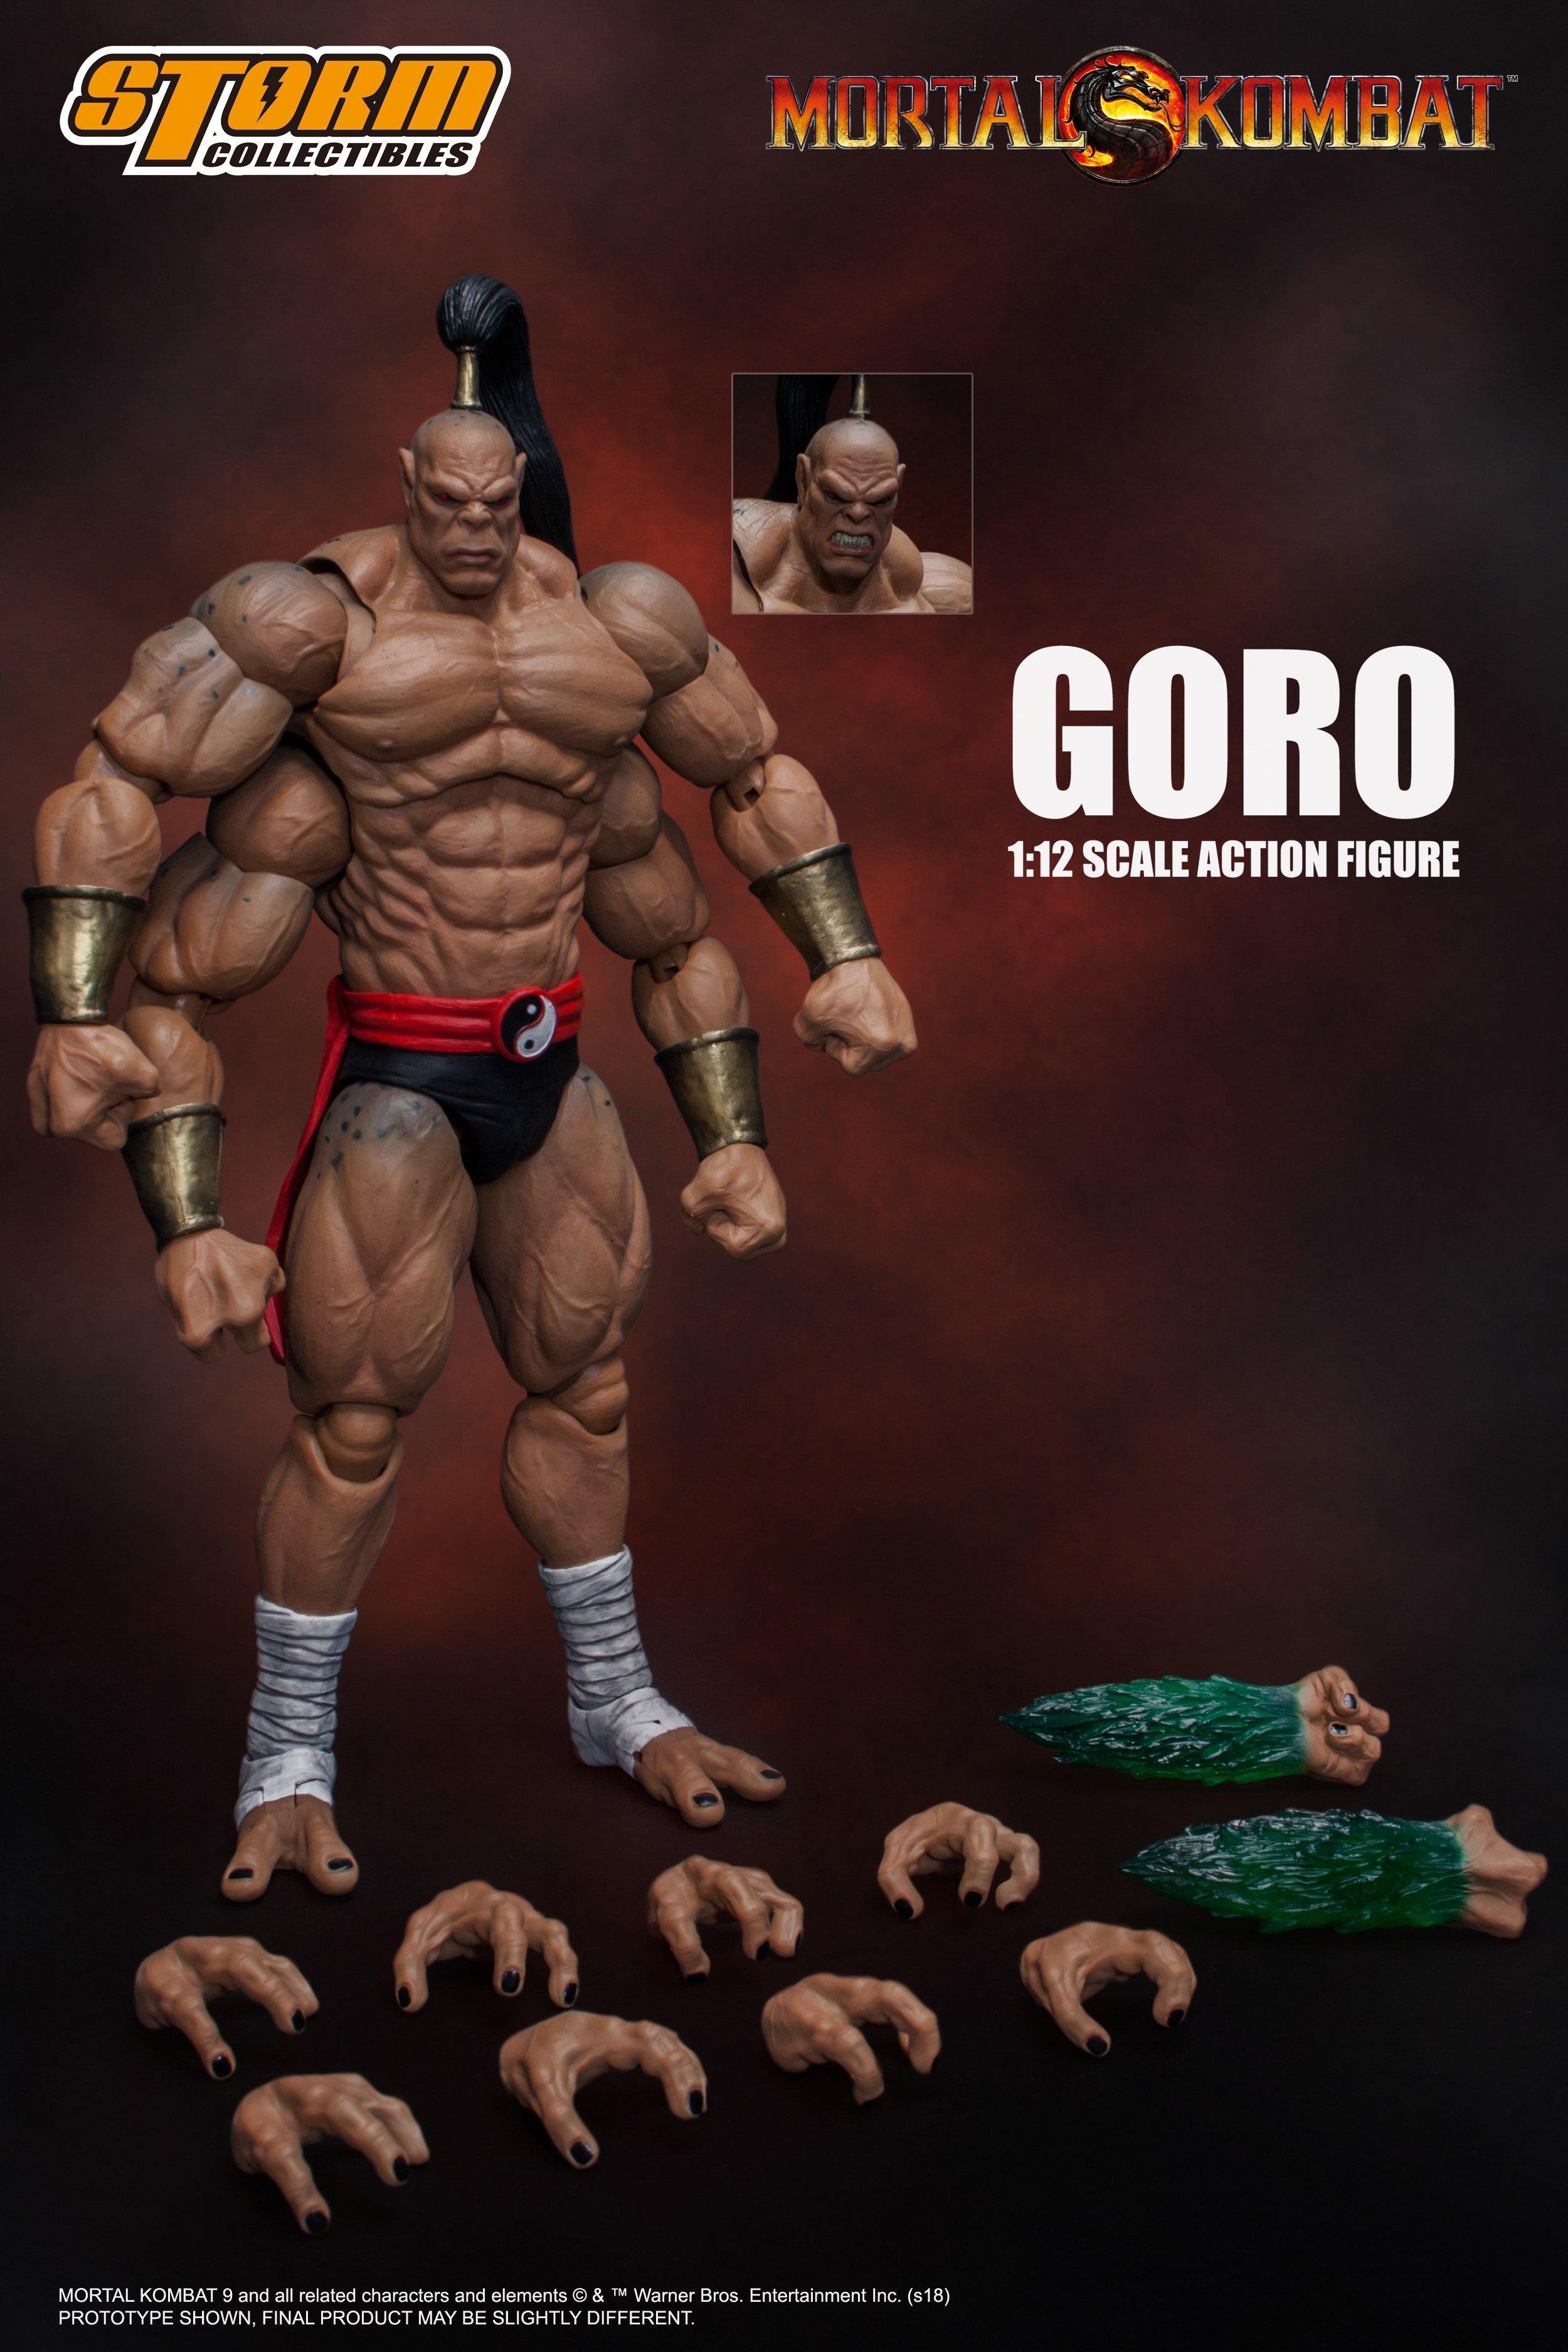 Mortal Kombat Goro Action Figure Gamestop